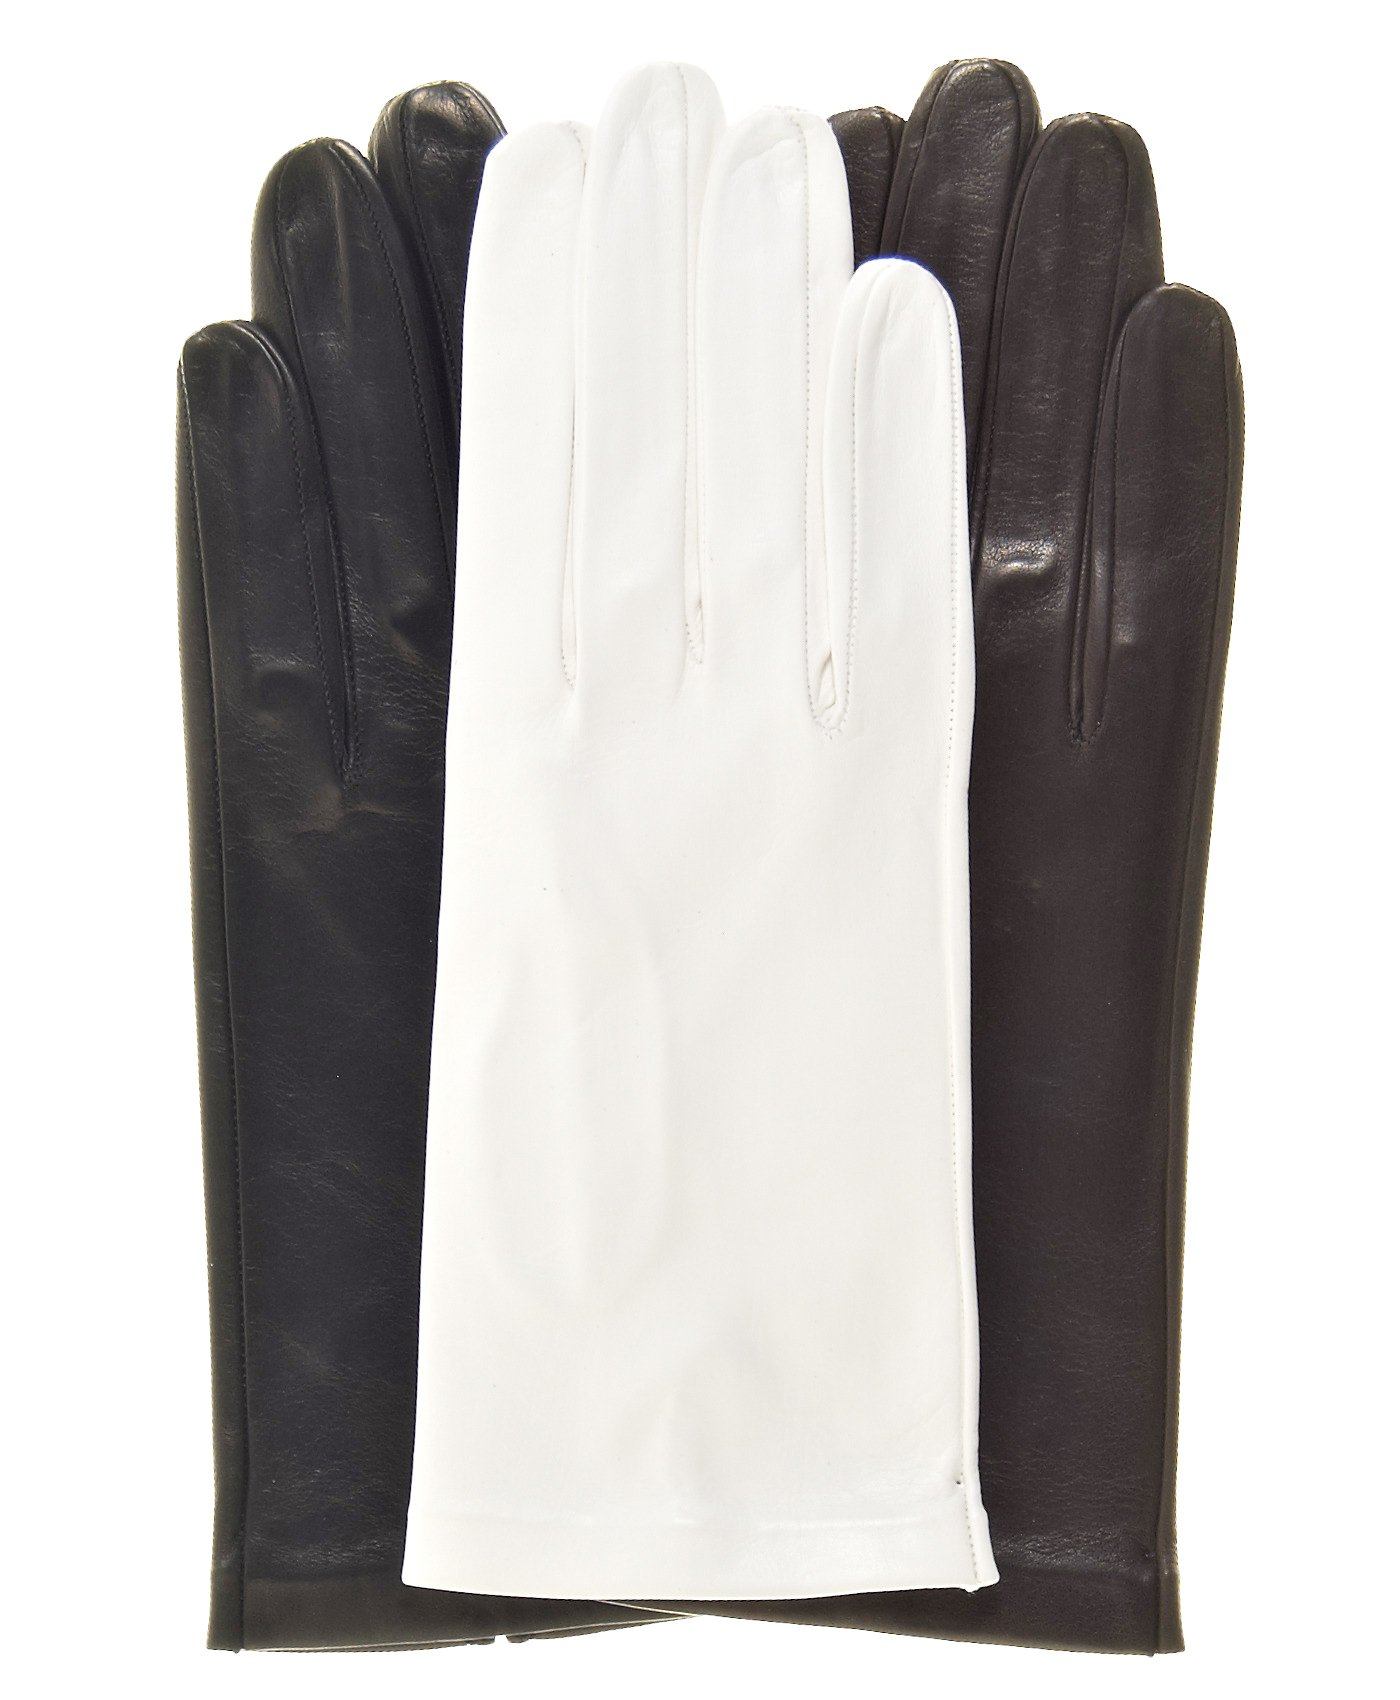 Fratelli Orsini Women's Italian Unlined Leather Gloves Size 7 Color Black